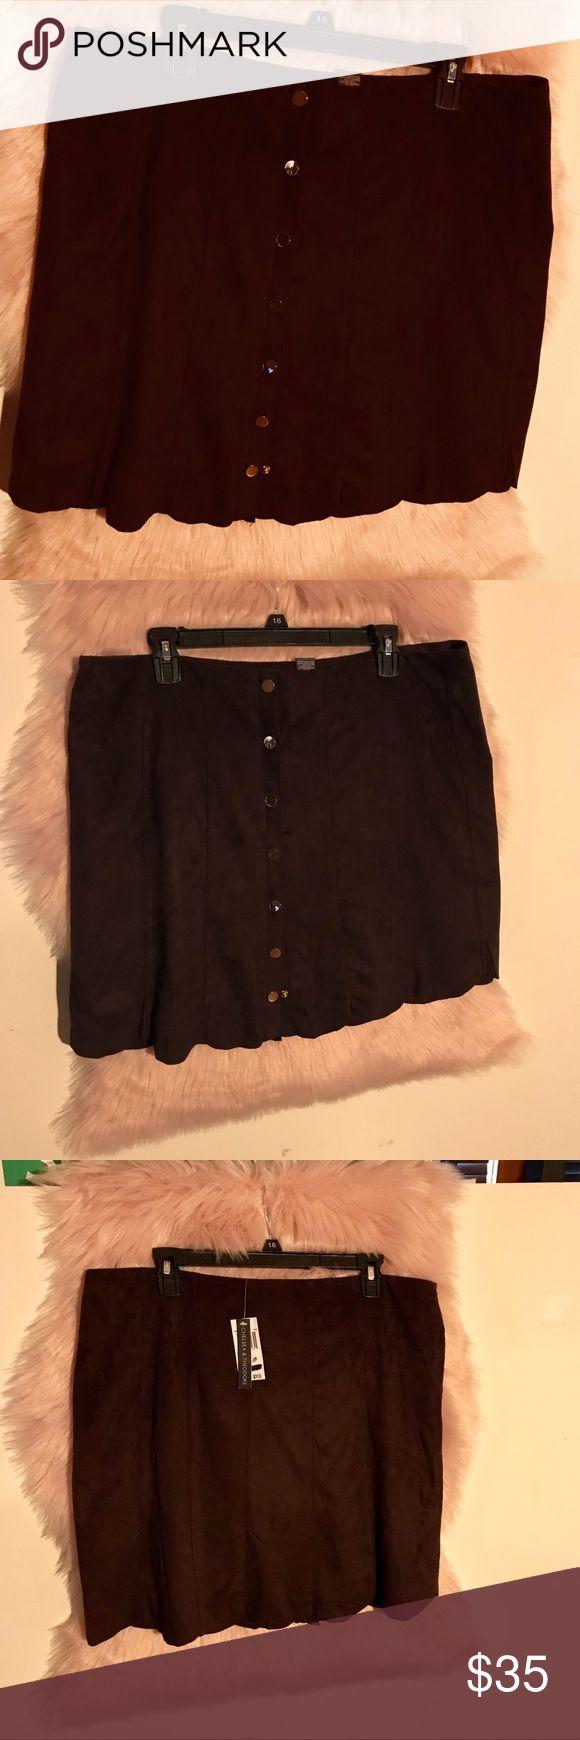 "Pretty Plum skirt XL Chelsea & Theodore. Plum color scalloped snap up skirt.   Crushed velvet feel. Plum lining. Very well-made. 19"" long Waist 37"" around.  Fun beautiful! Chelsea & Theodore Skirts"